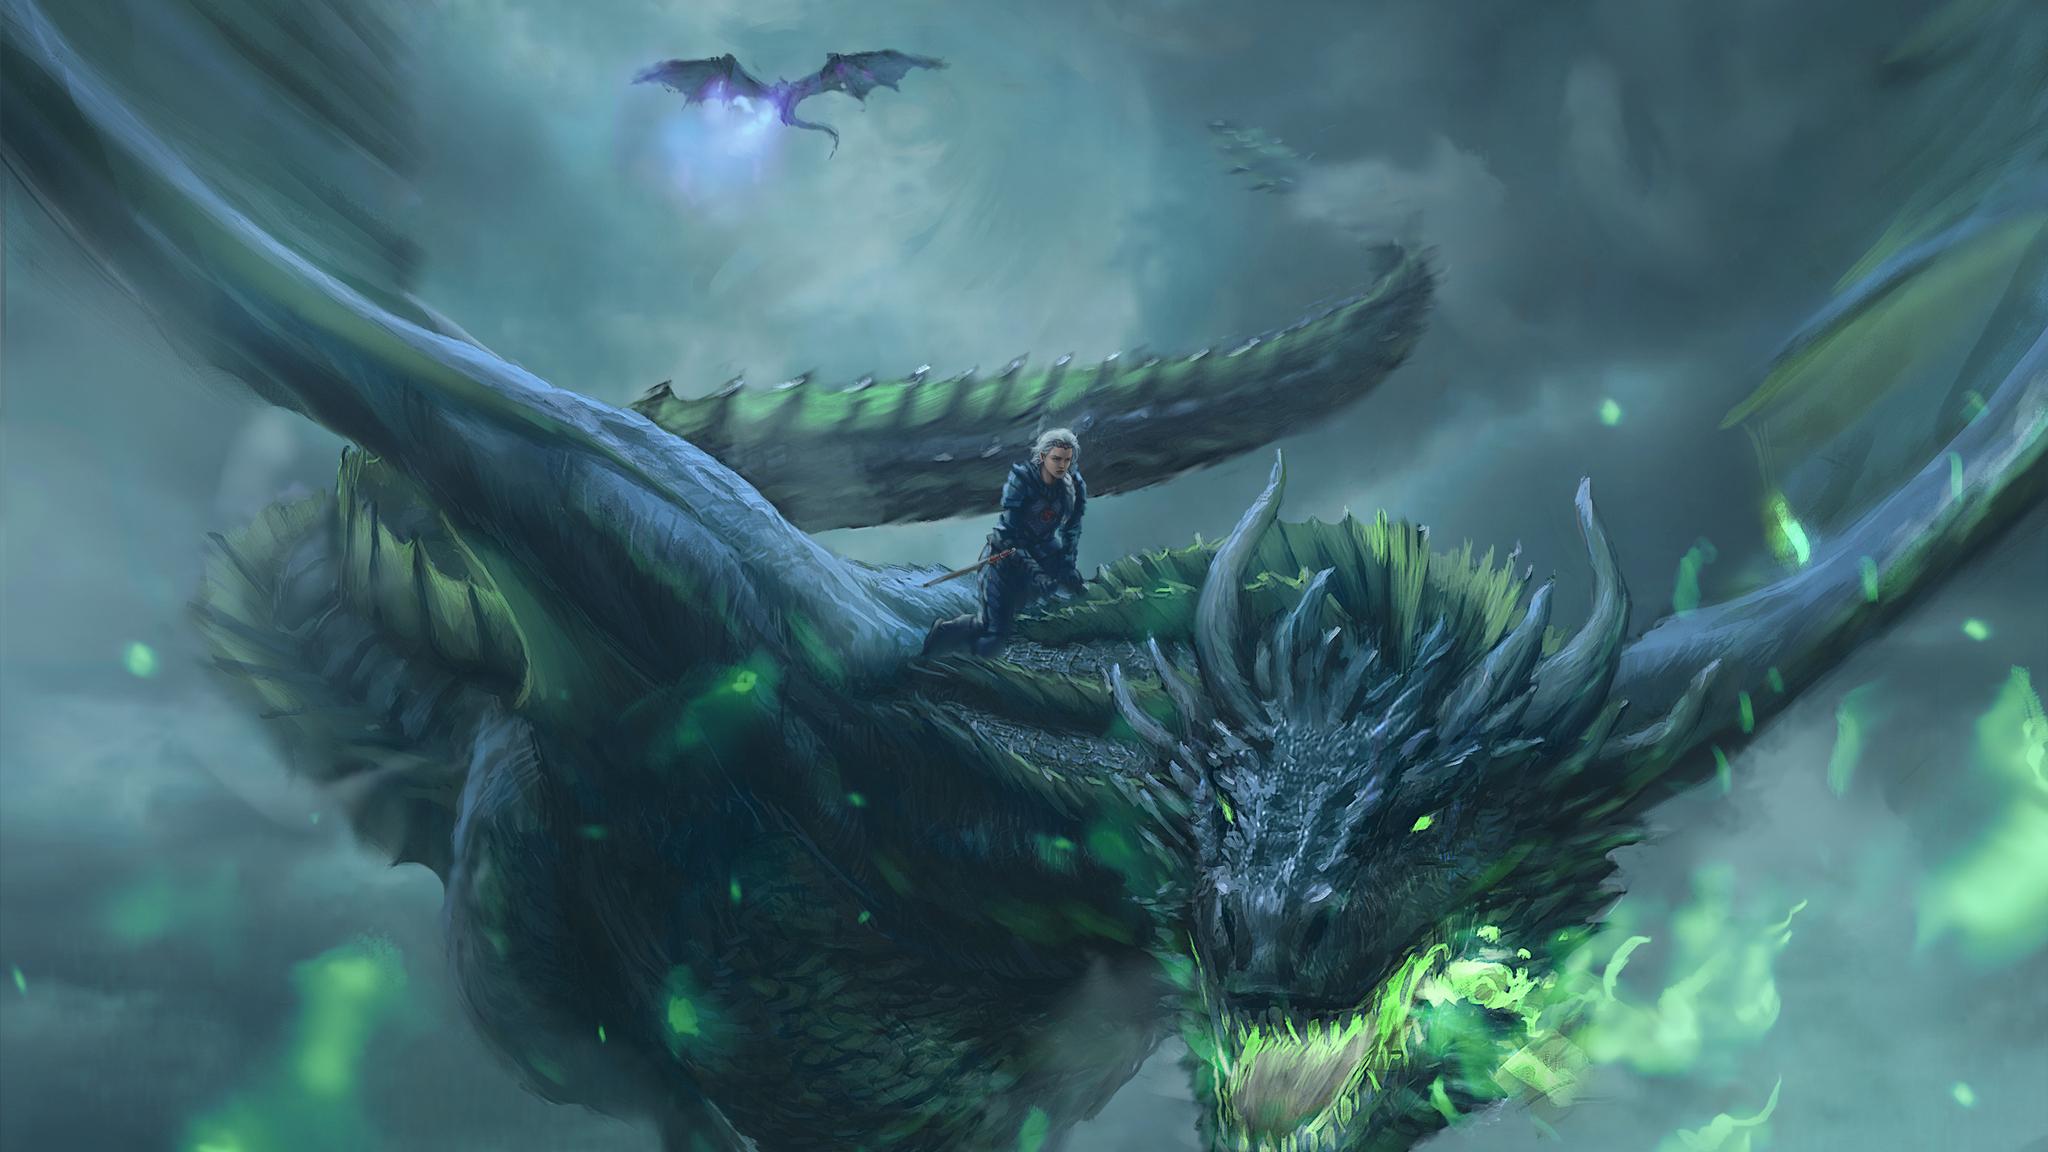 4k Game Of Thrones Wallpaper: 2048x1152 Daenerys Targaryen Dragon Digital Art 4k